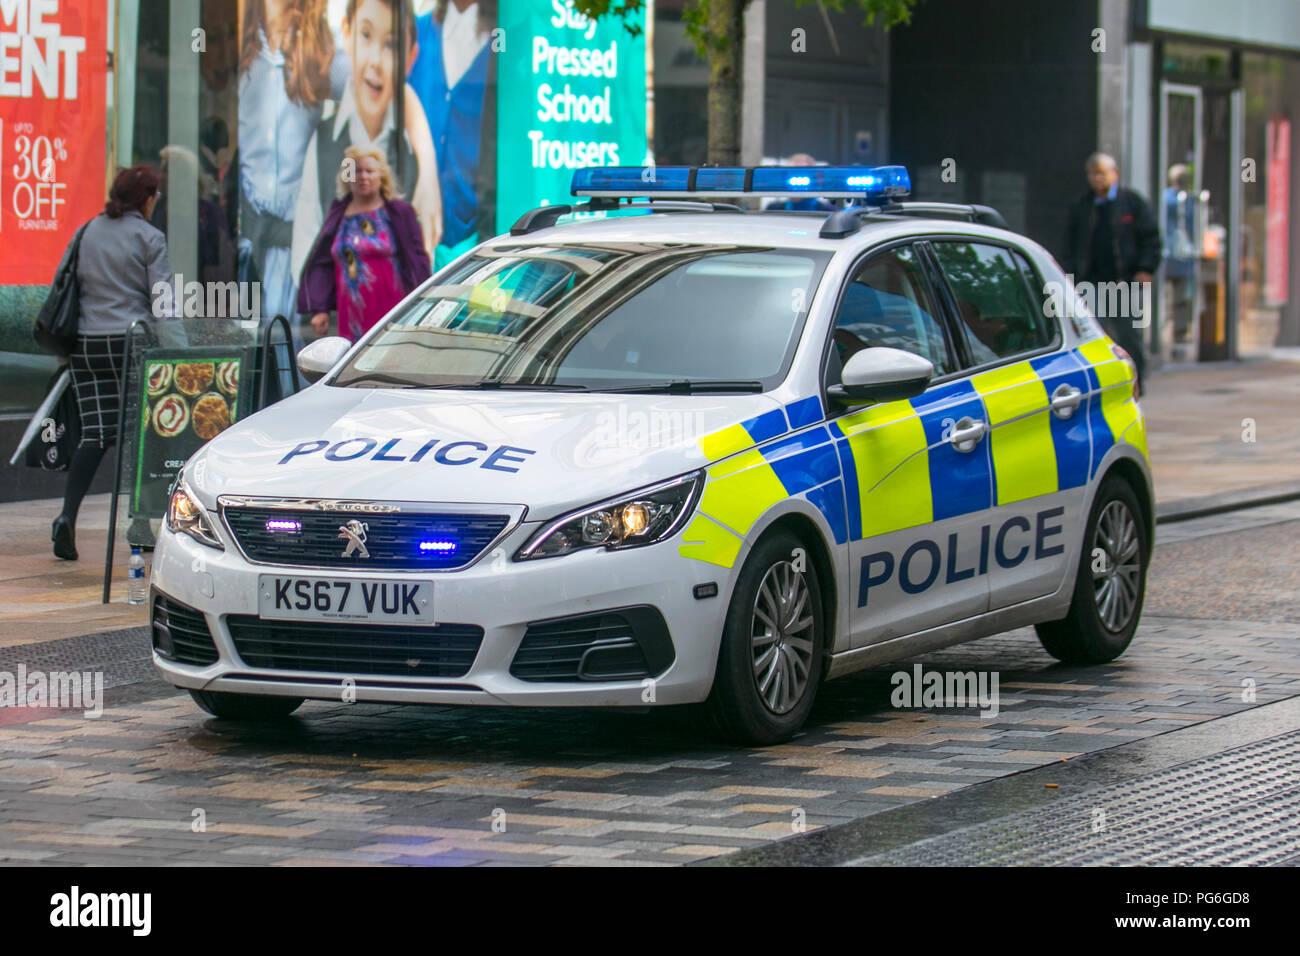 Police emergency response vehicle in Fishergate, Preston, UK Stock Photo